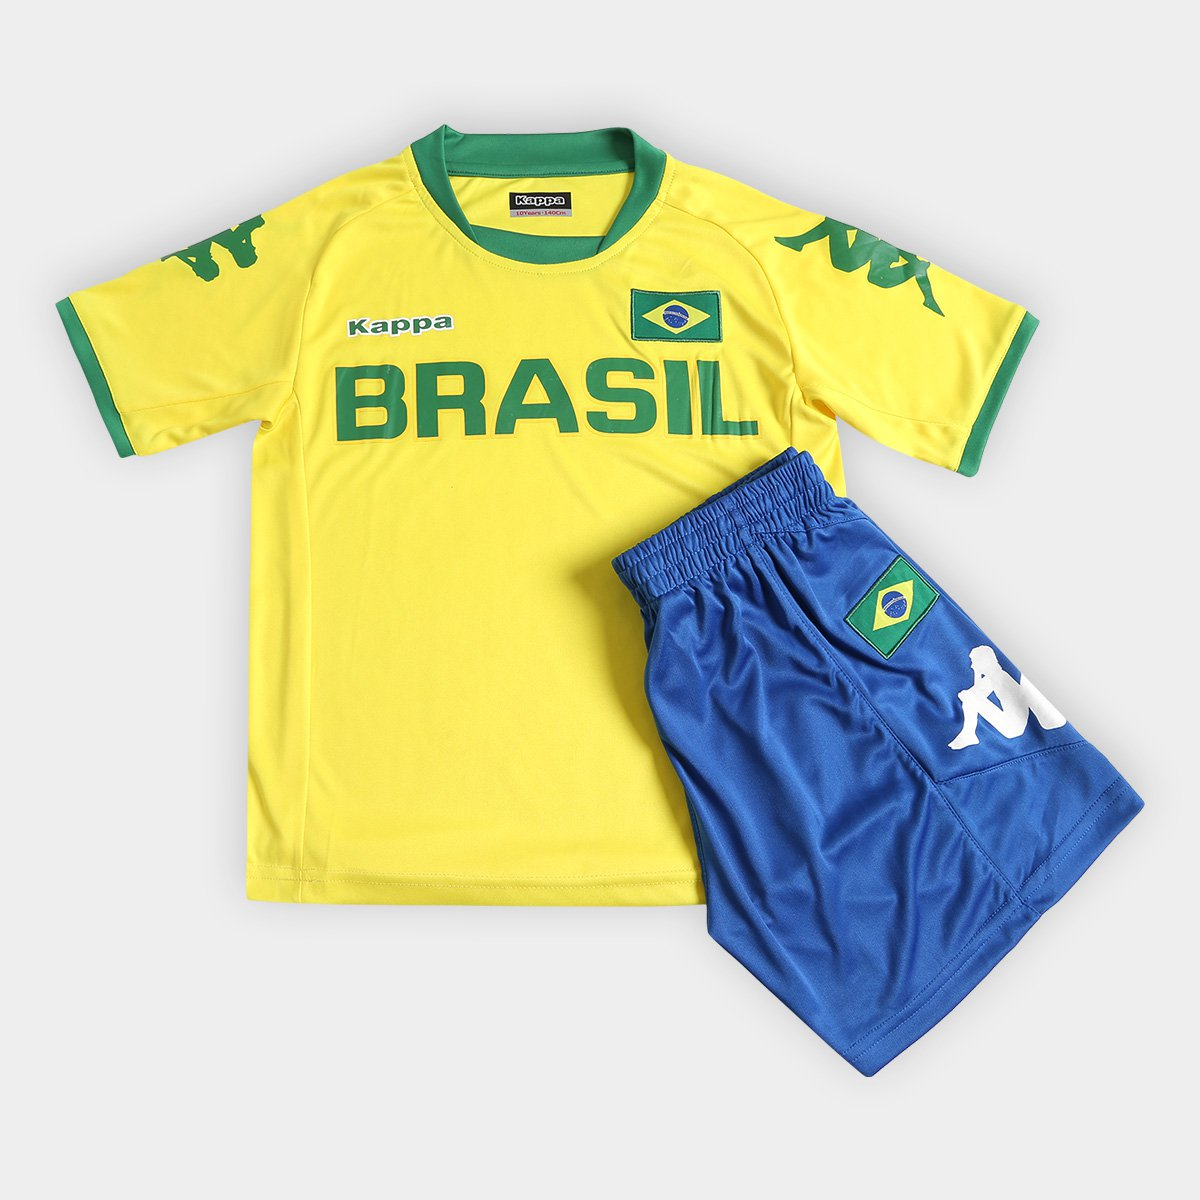 53979e4bf3a31 52%OFF Kit Kappa Brasil Infantil